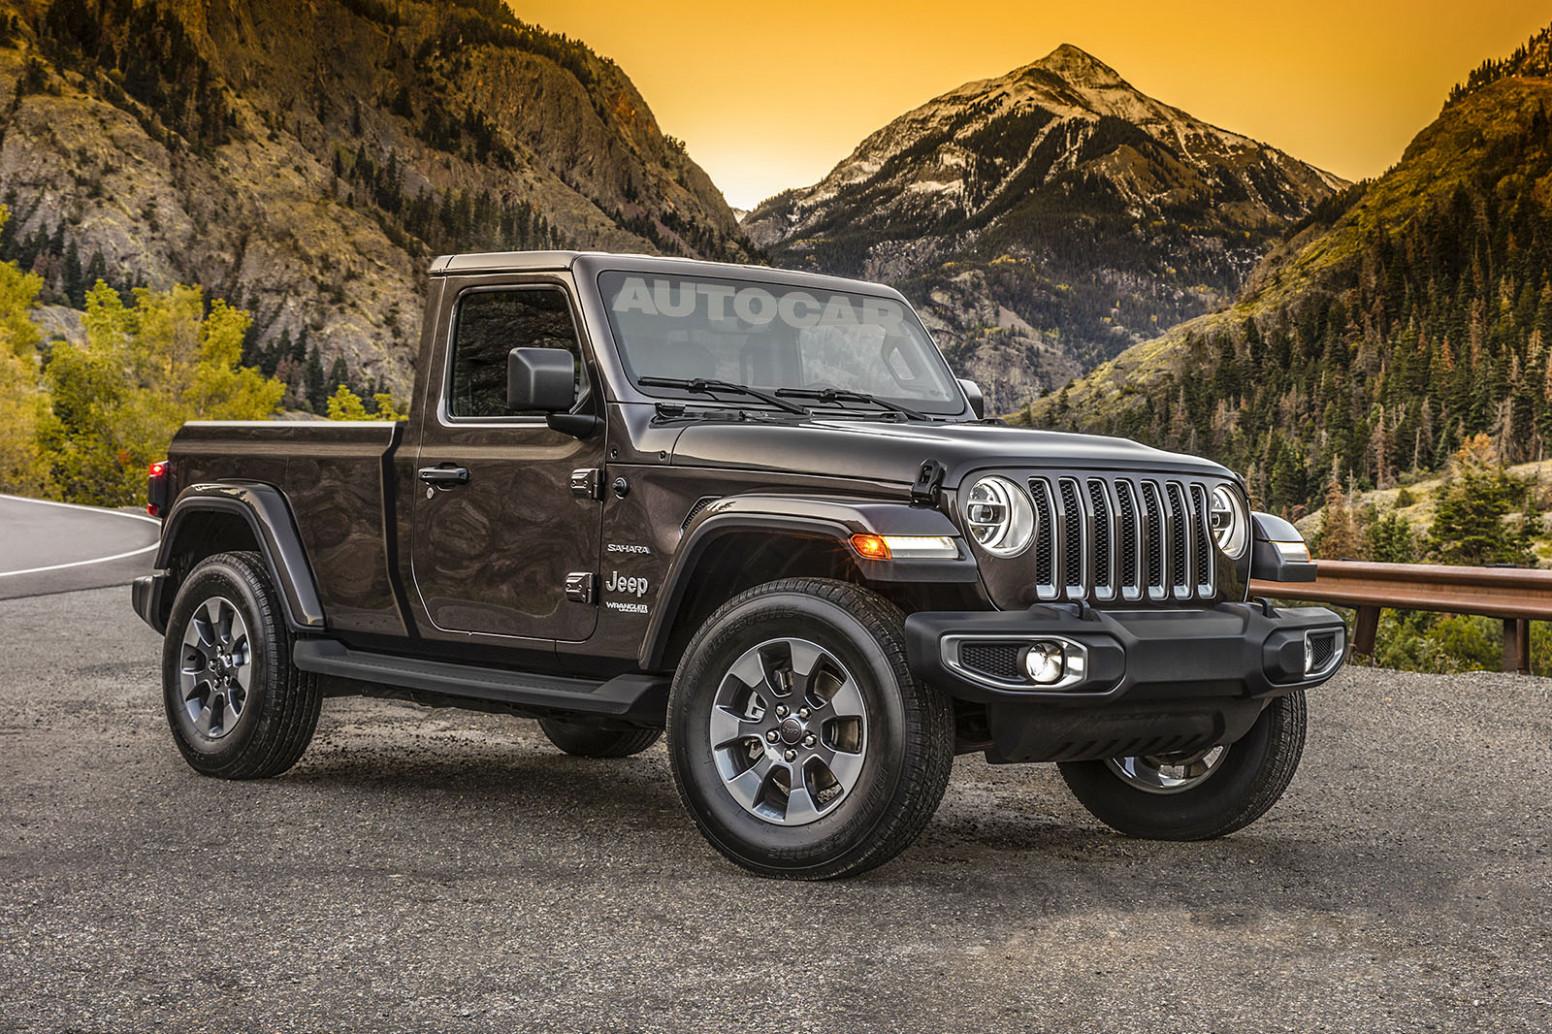 Overview 2022 Jeep Wrangler Rubicon